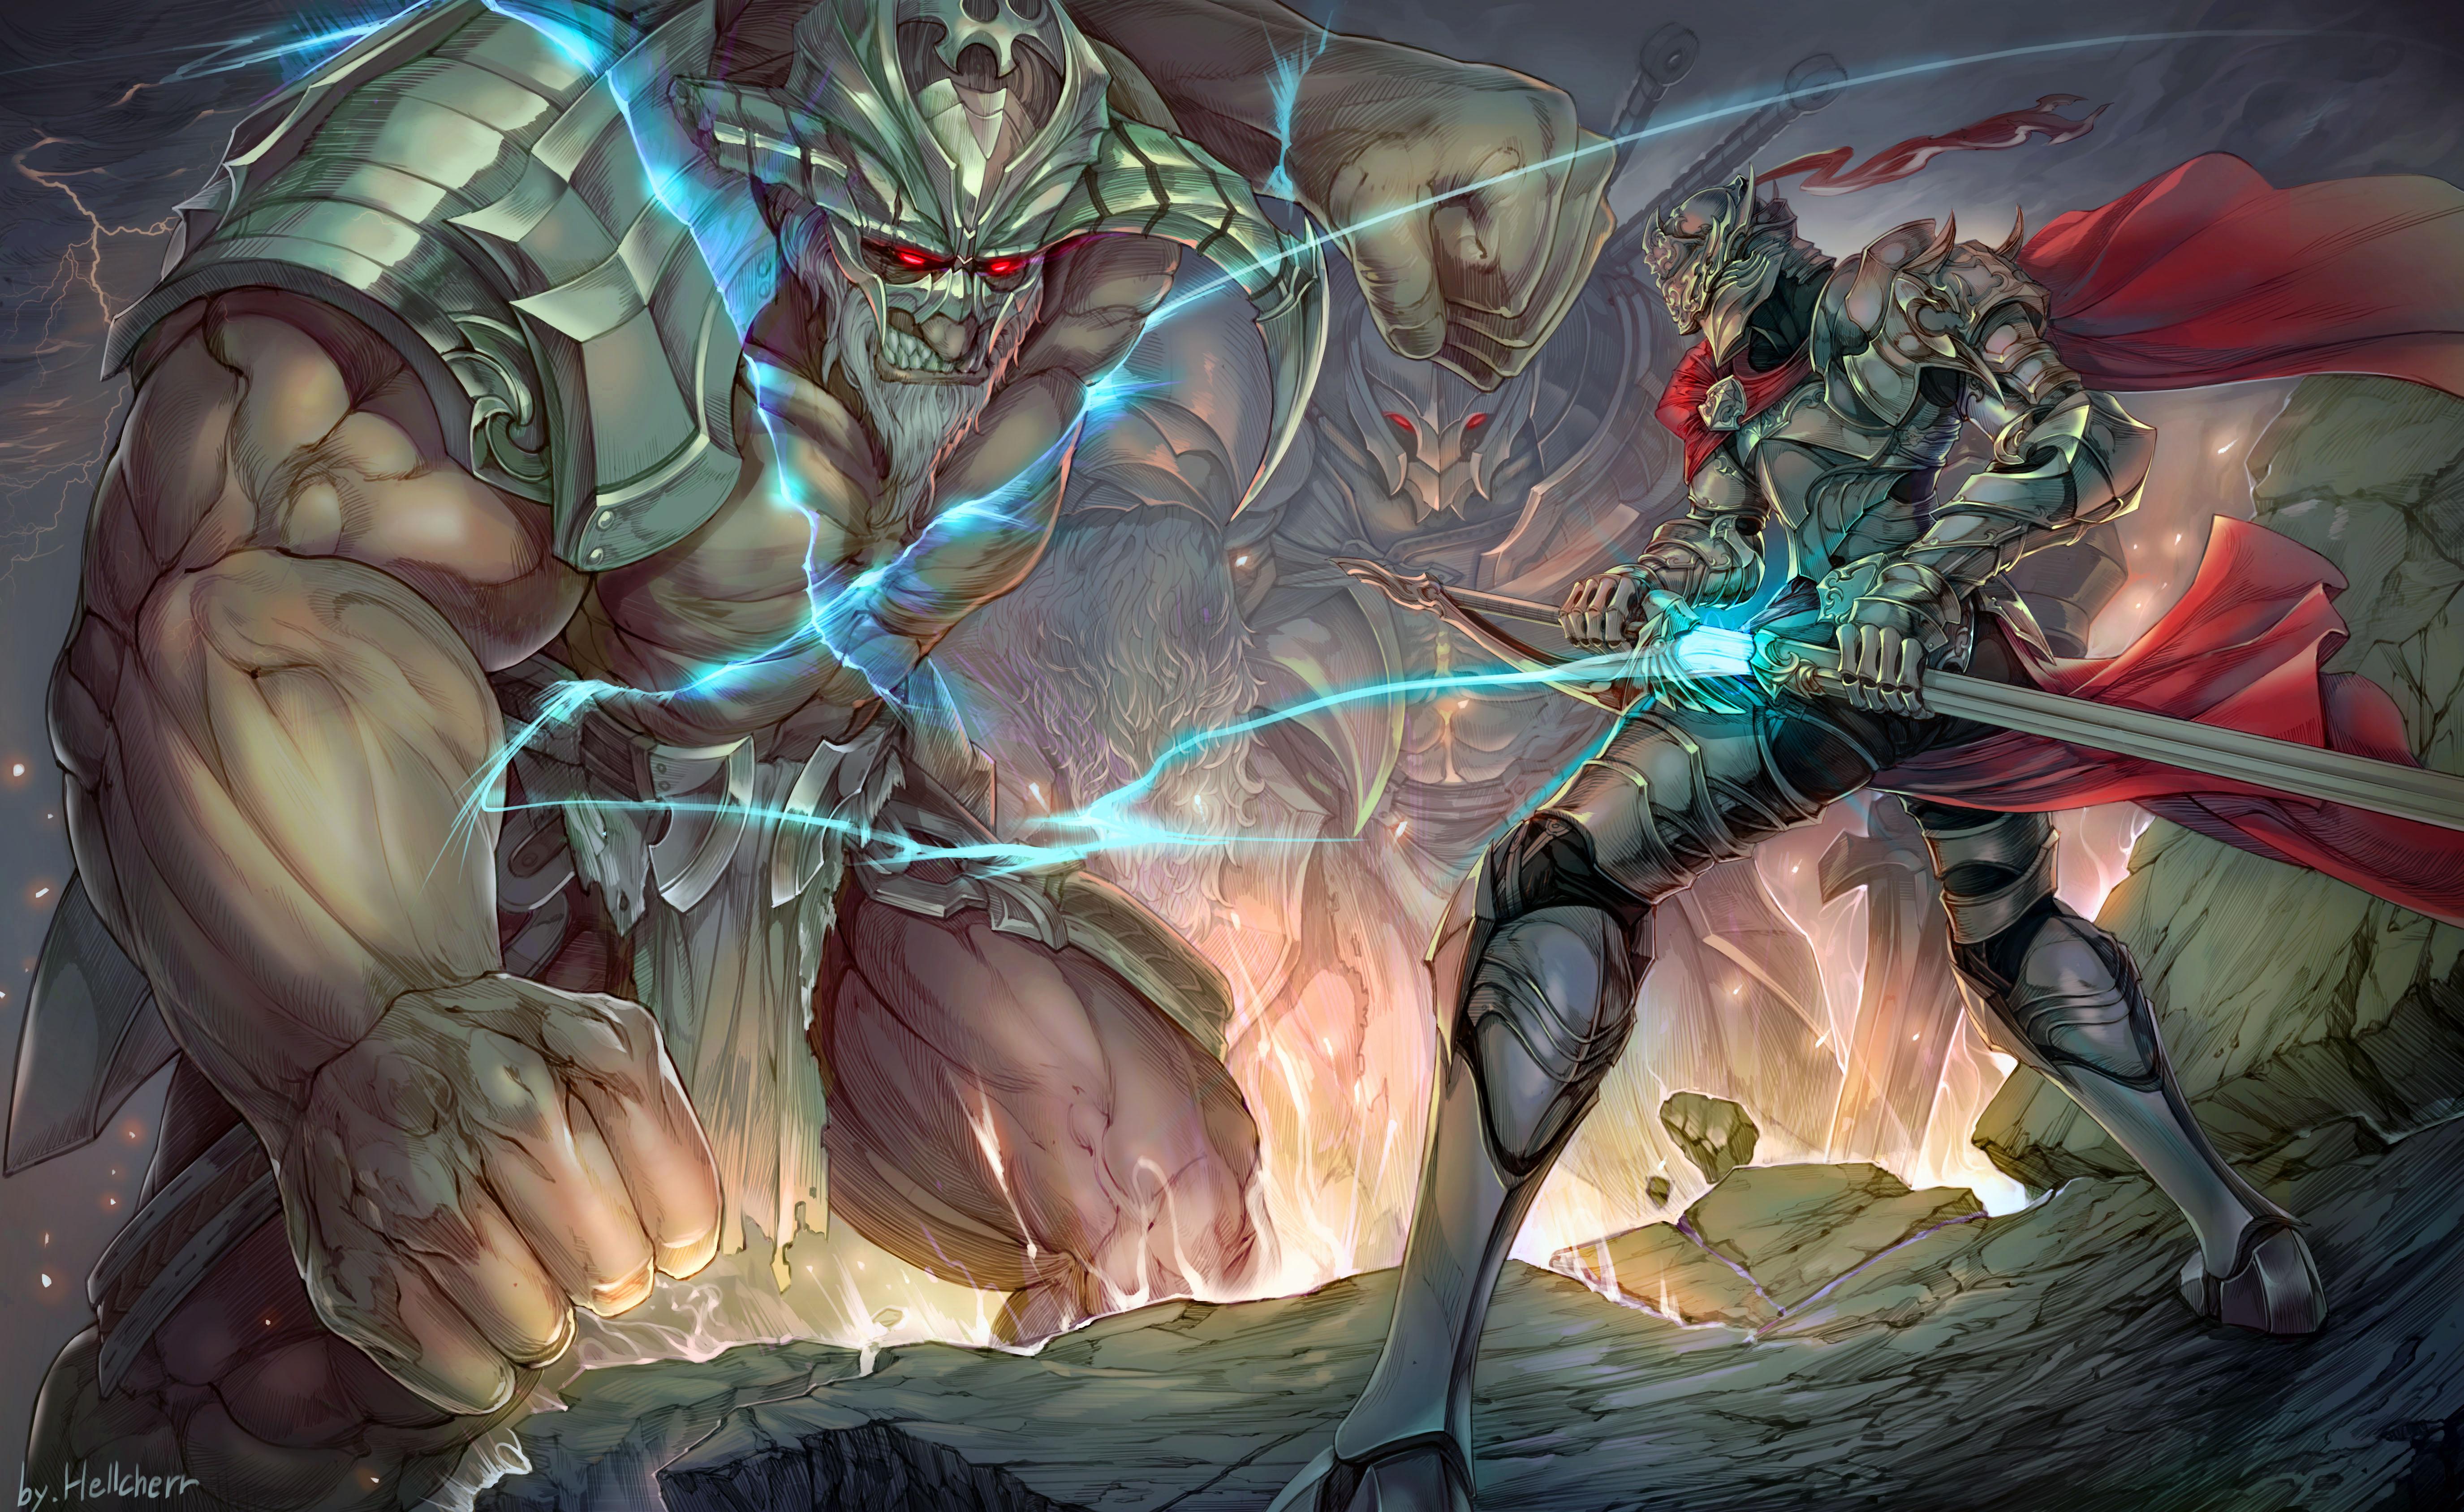 Armor Battle Giant Knight Sword Warrior 5500x3376